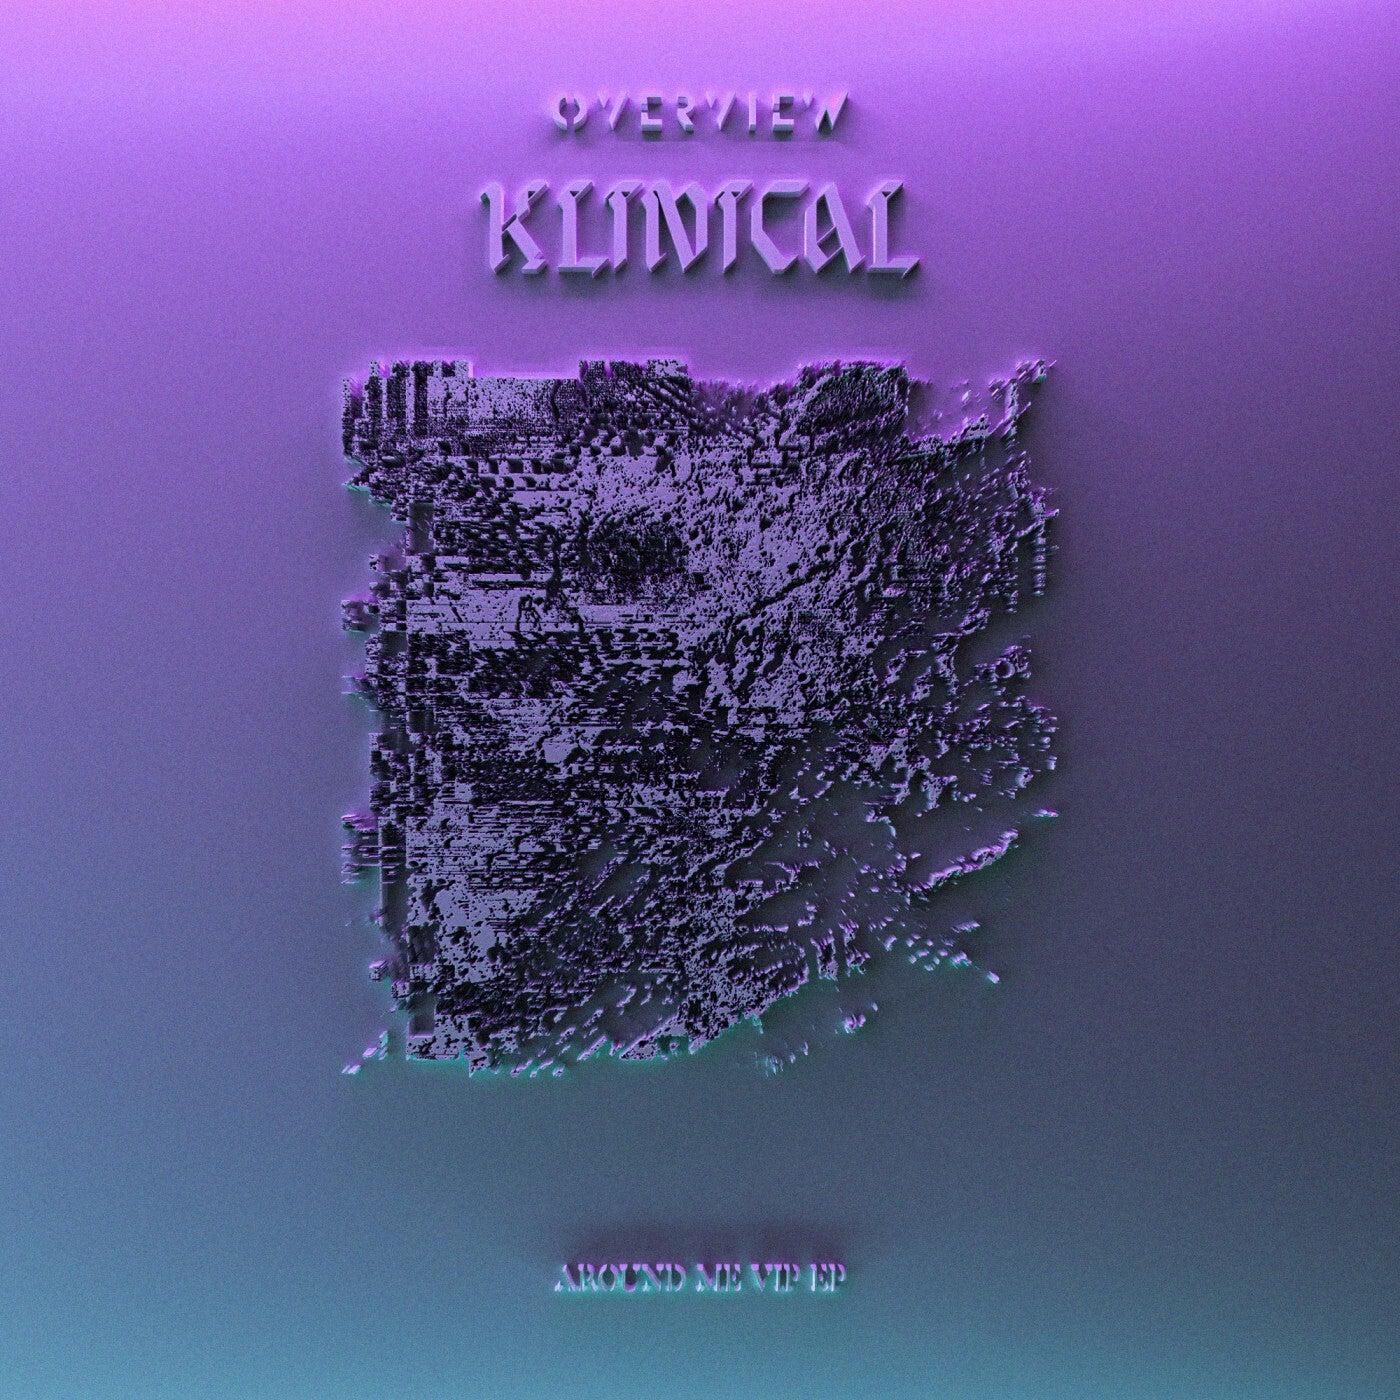 Around Me VIP (Original Mix)